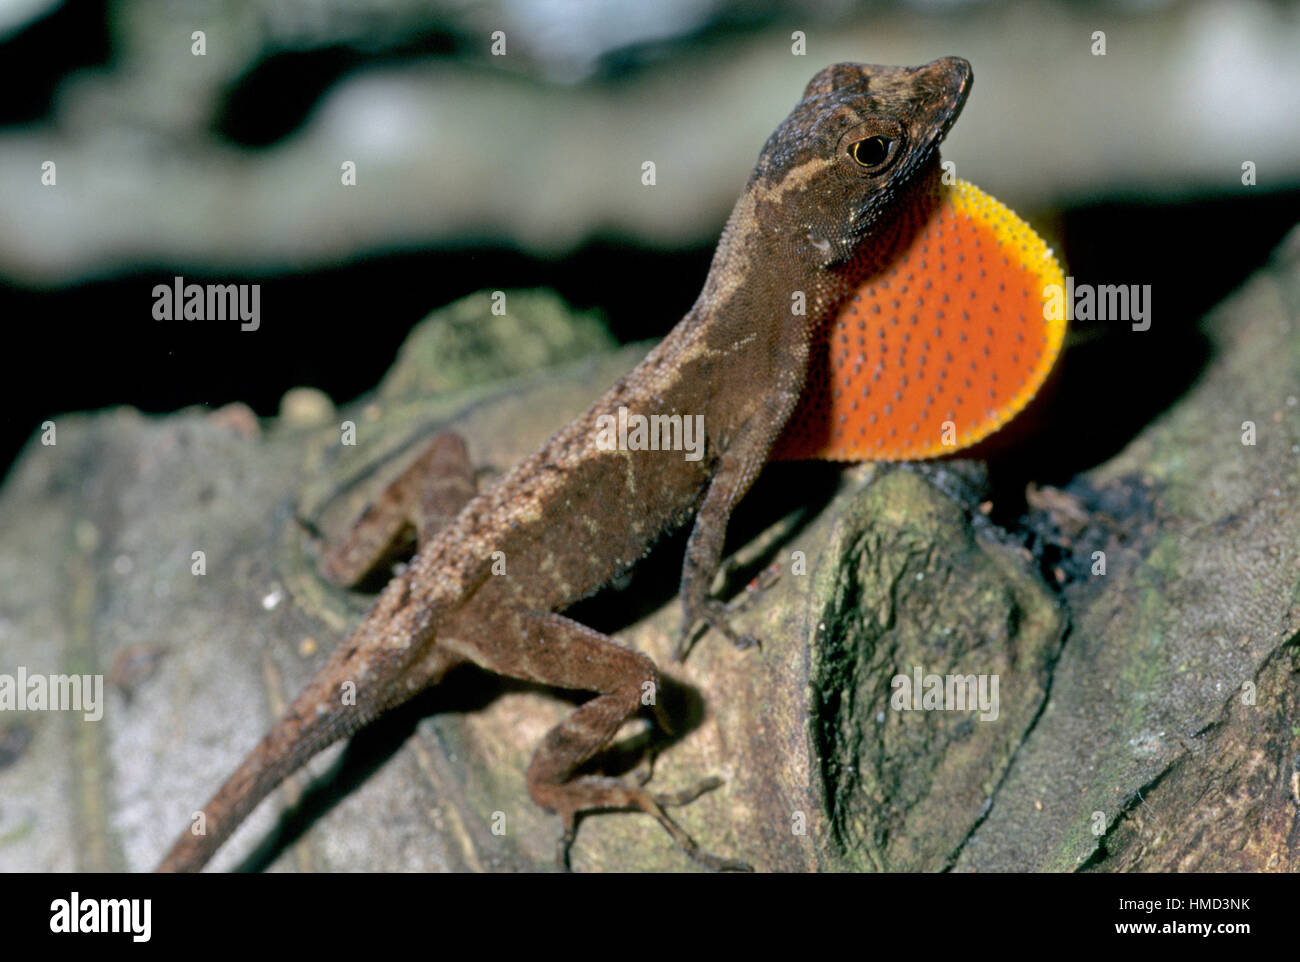 Male Ground anole (Norops humilis) displaying dewlap. Gandoca Manzanillo Wildlife Refuge, Costa Rica - Stock Image